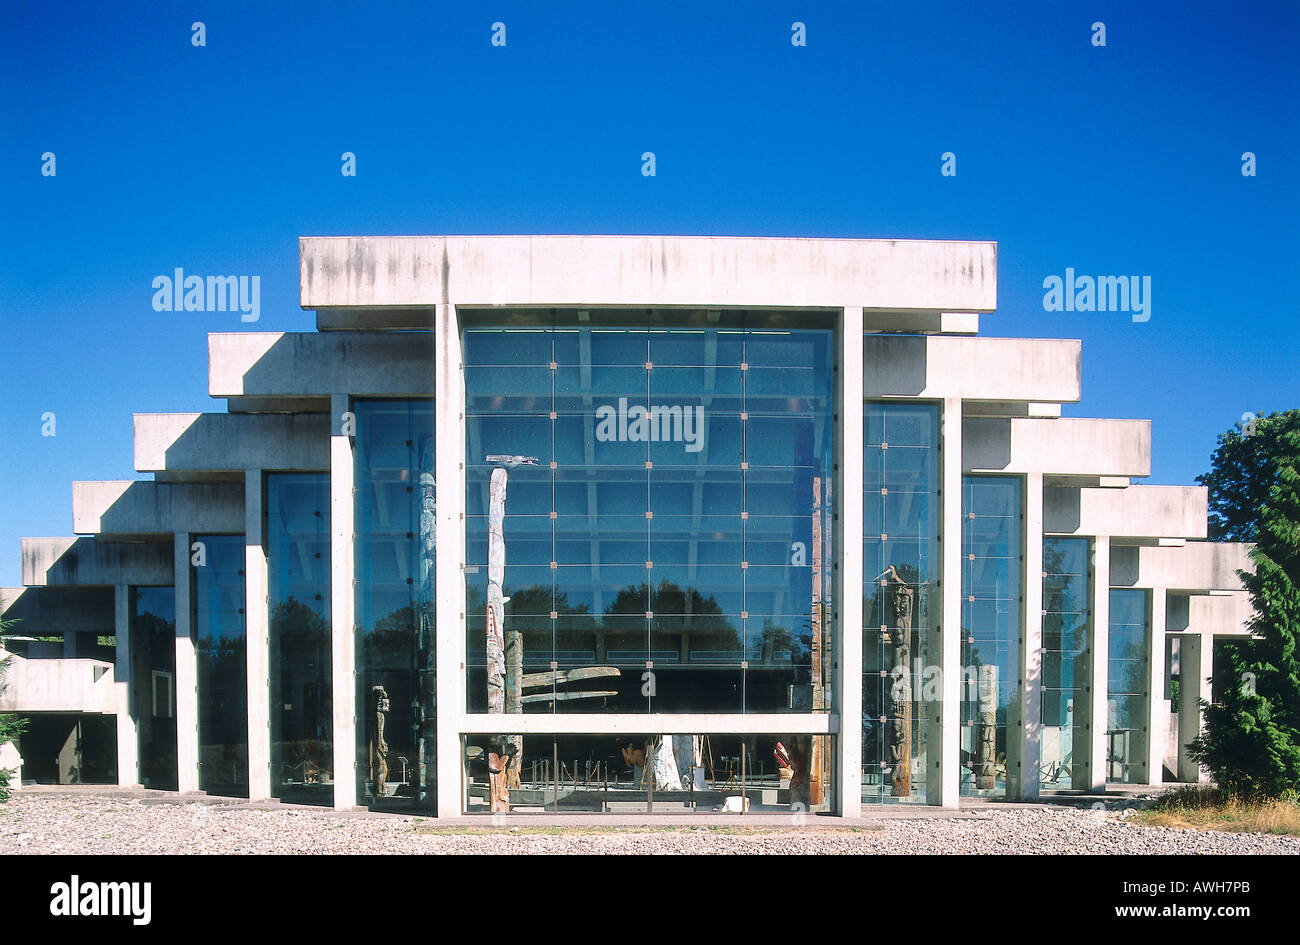 Moa Ubc Architecture Stockfotos & Moa Ubc Architecture Bilder - Alamy